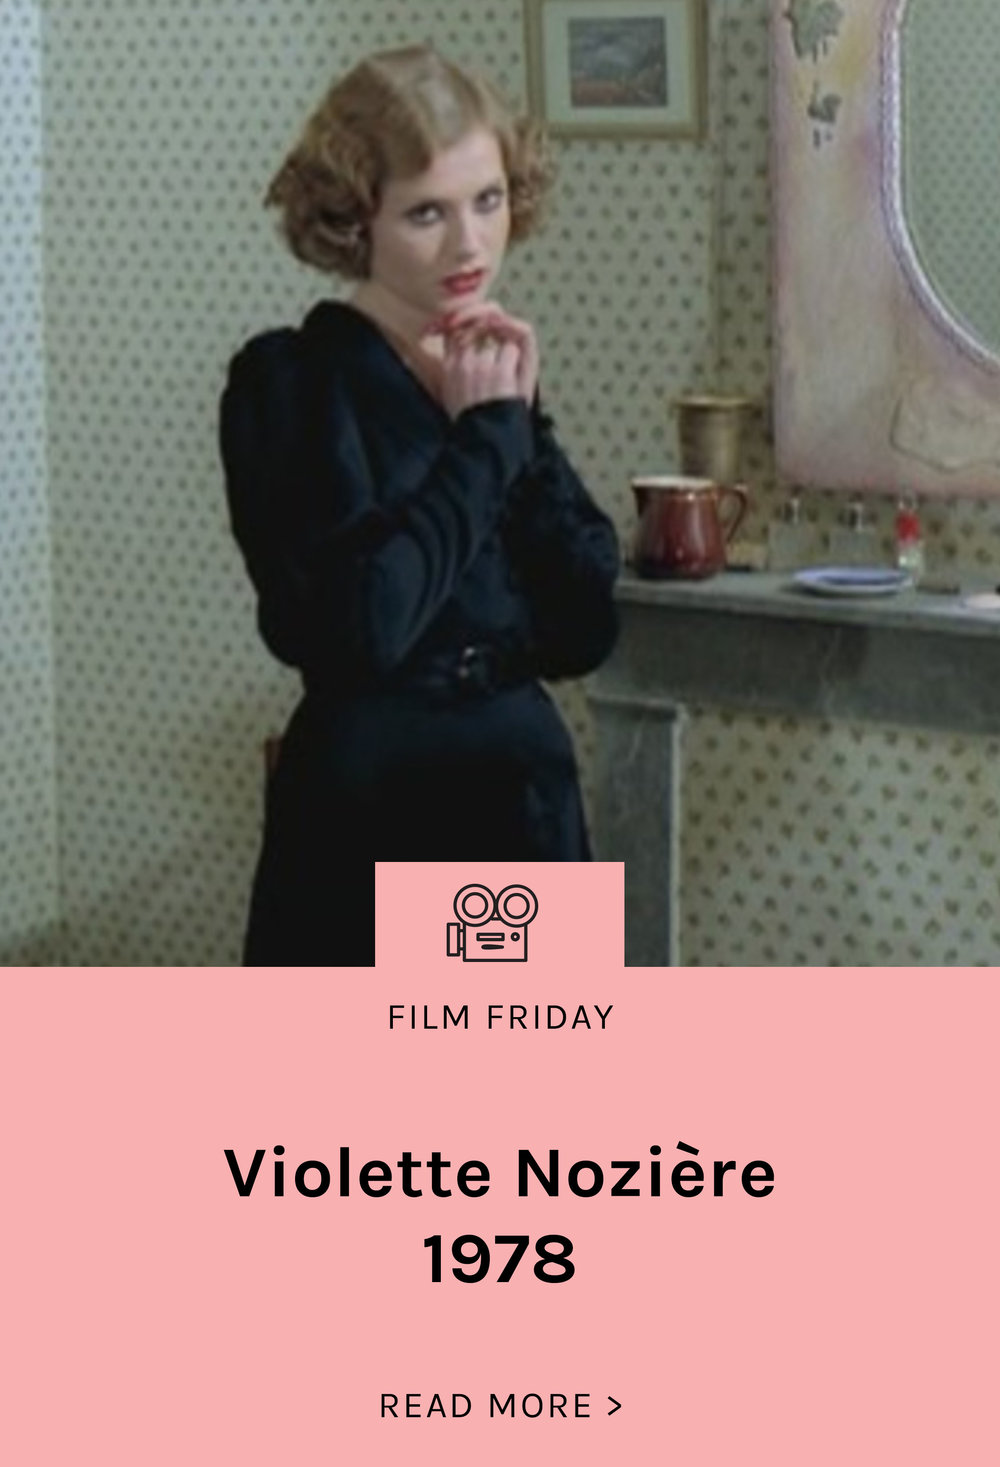 FilmFriday-BlogLanding-Violette-Nozière.jpg